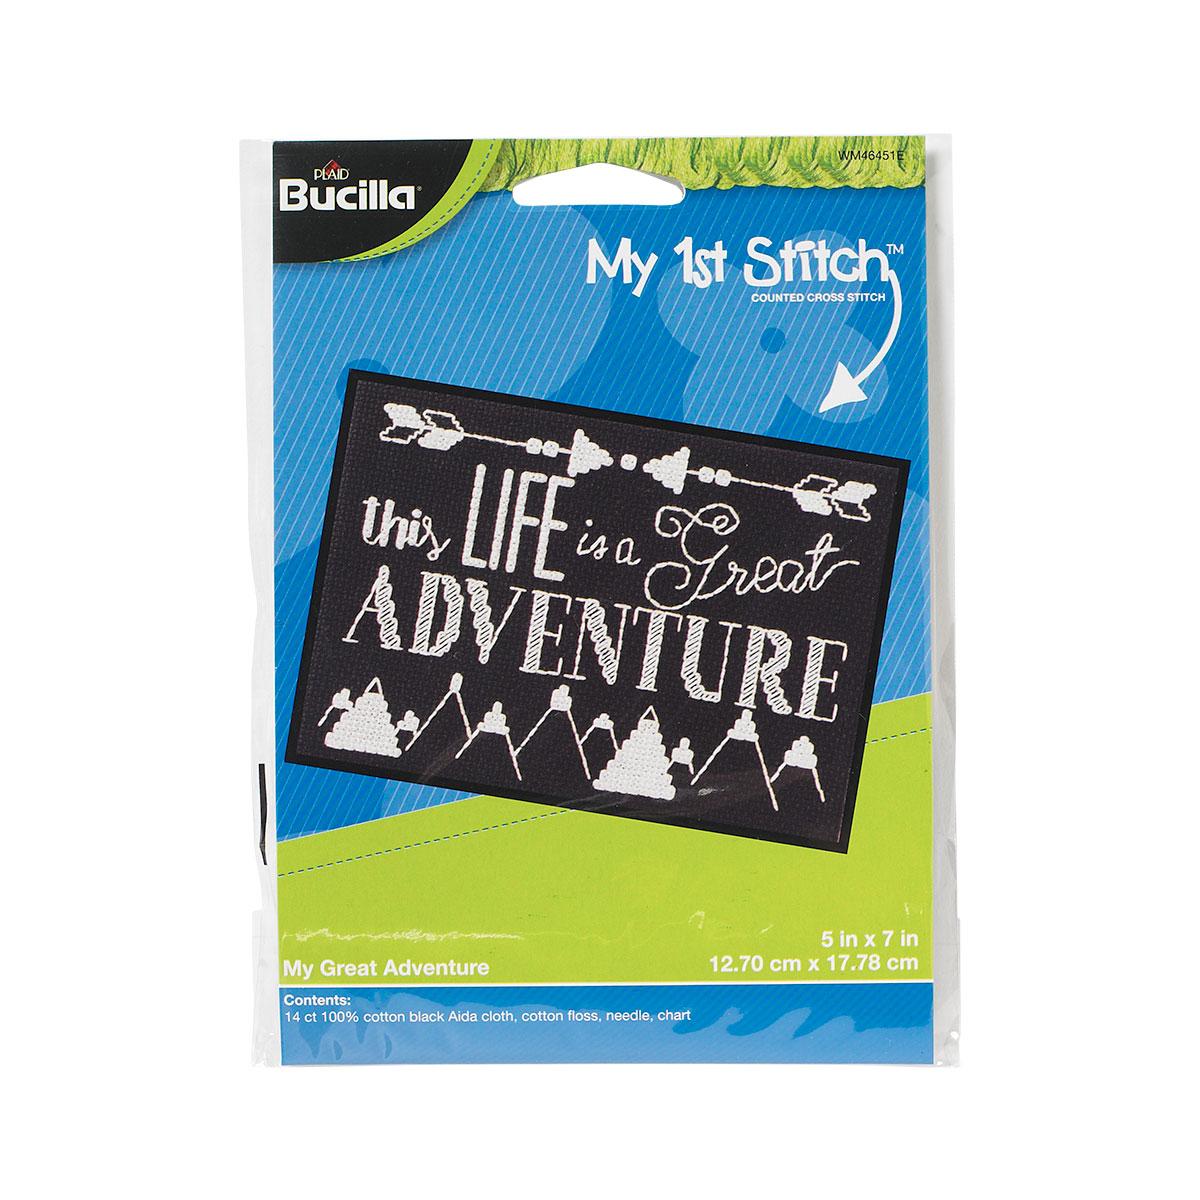 Bucilla ® My 1st Stitch™ - Counted Cross Stitch Kits - My Great Adventure